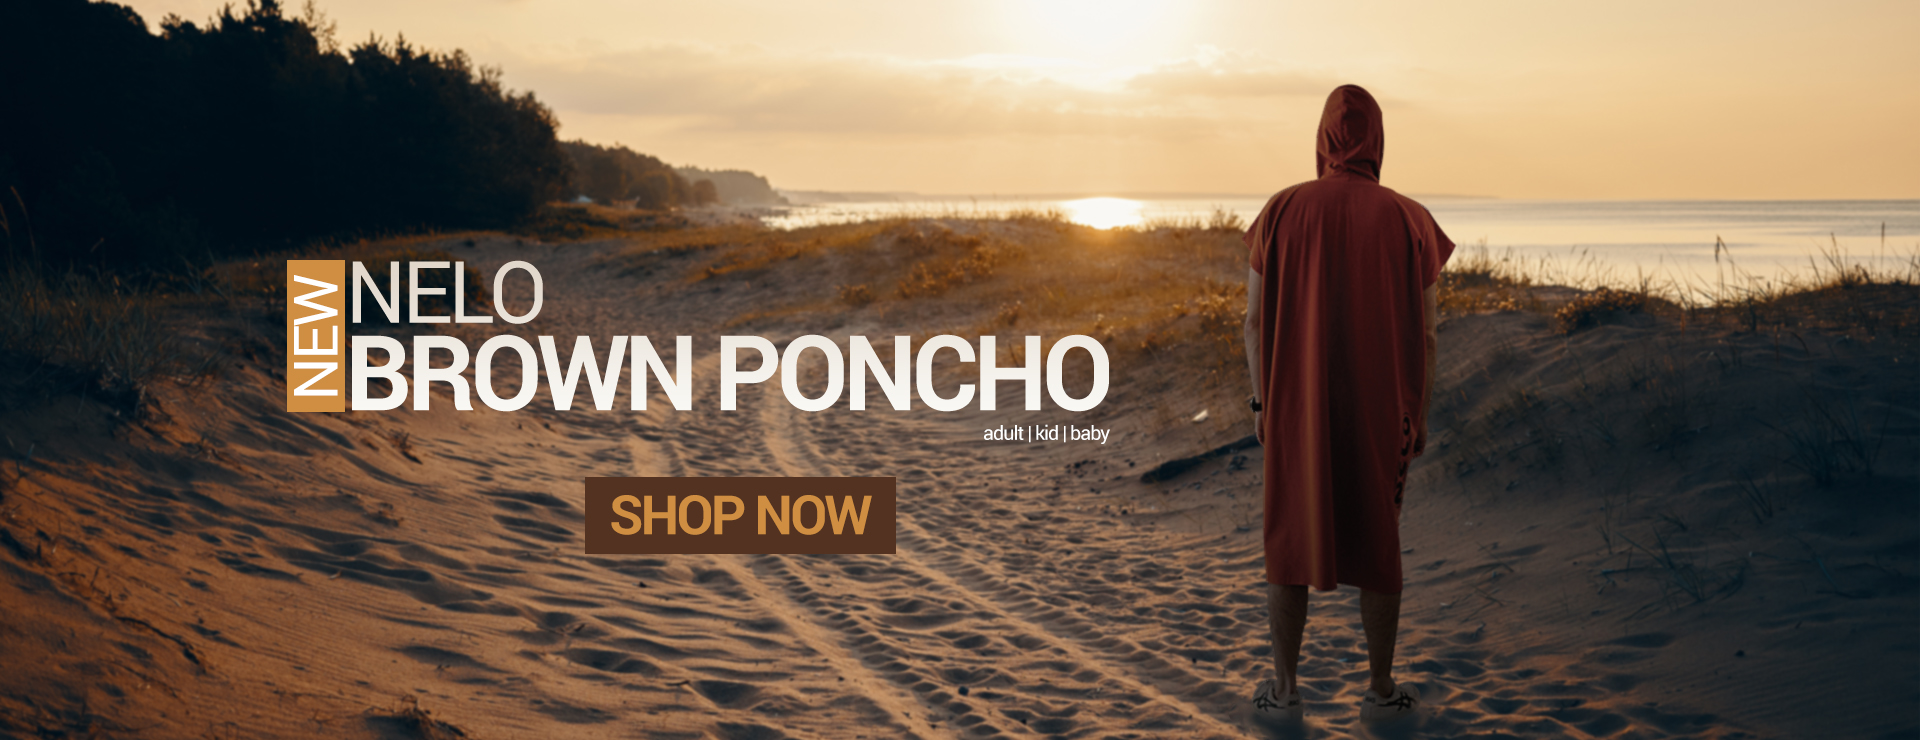 Nelo Brown Poncho